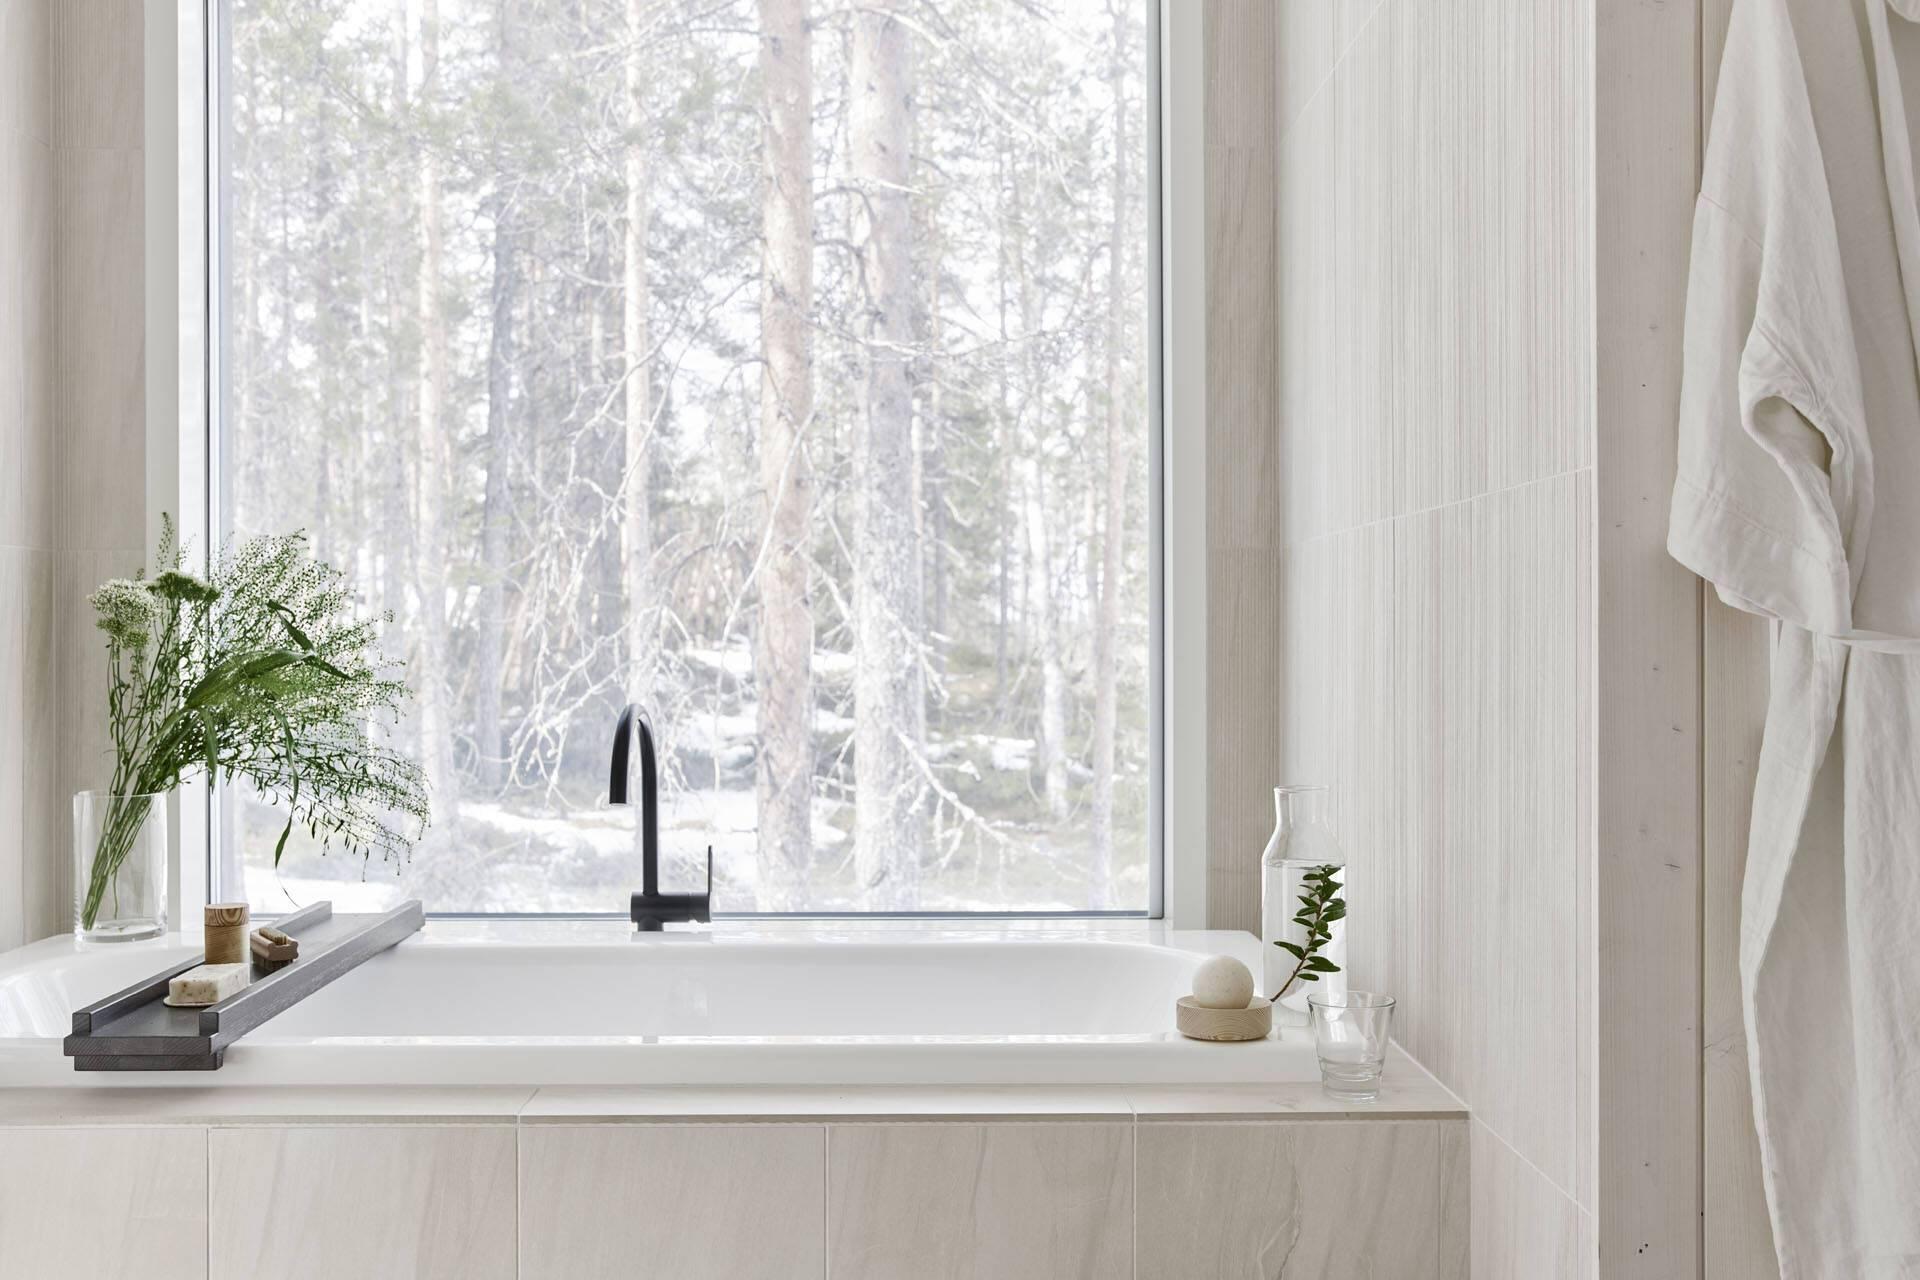 Laponie Finlandaise ArcticScene Executive Suite Wellness Area